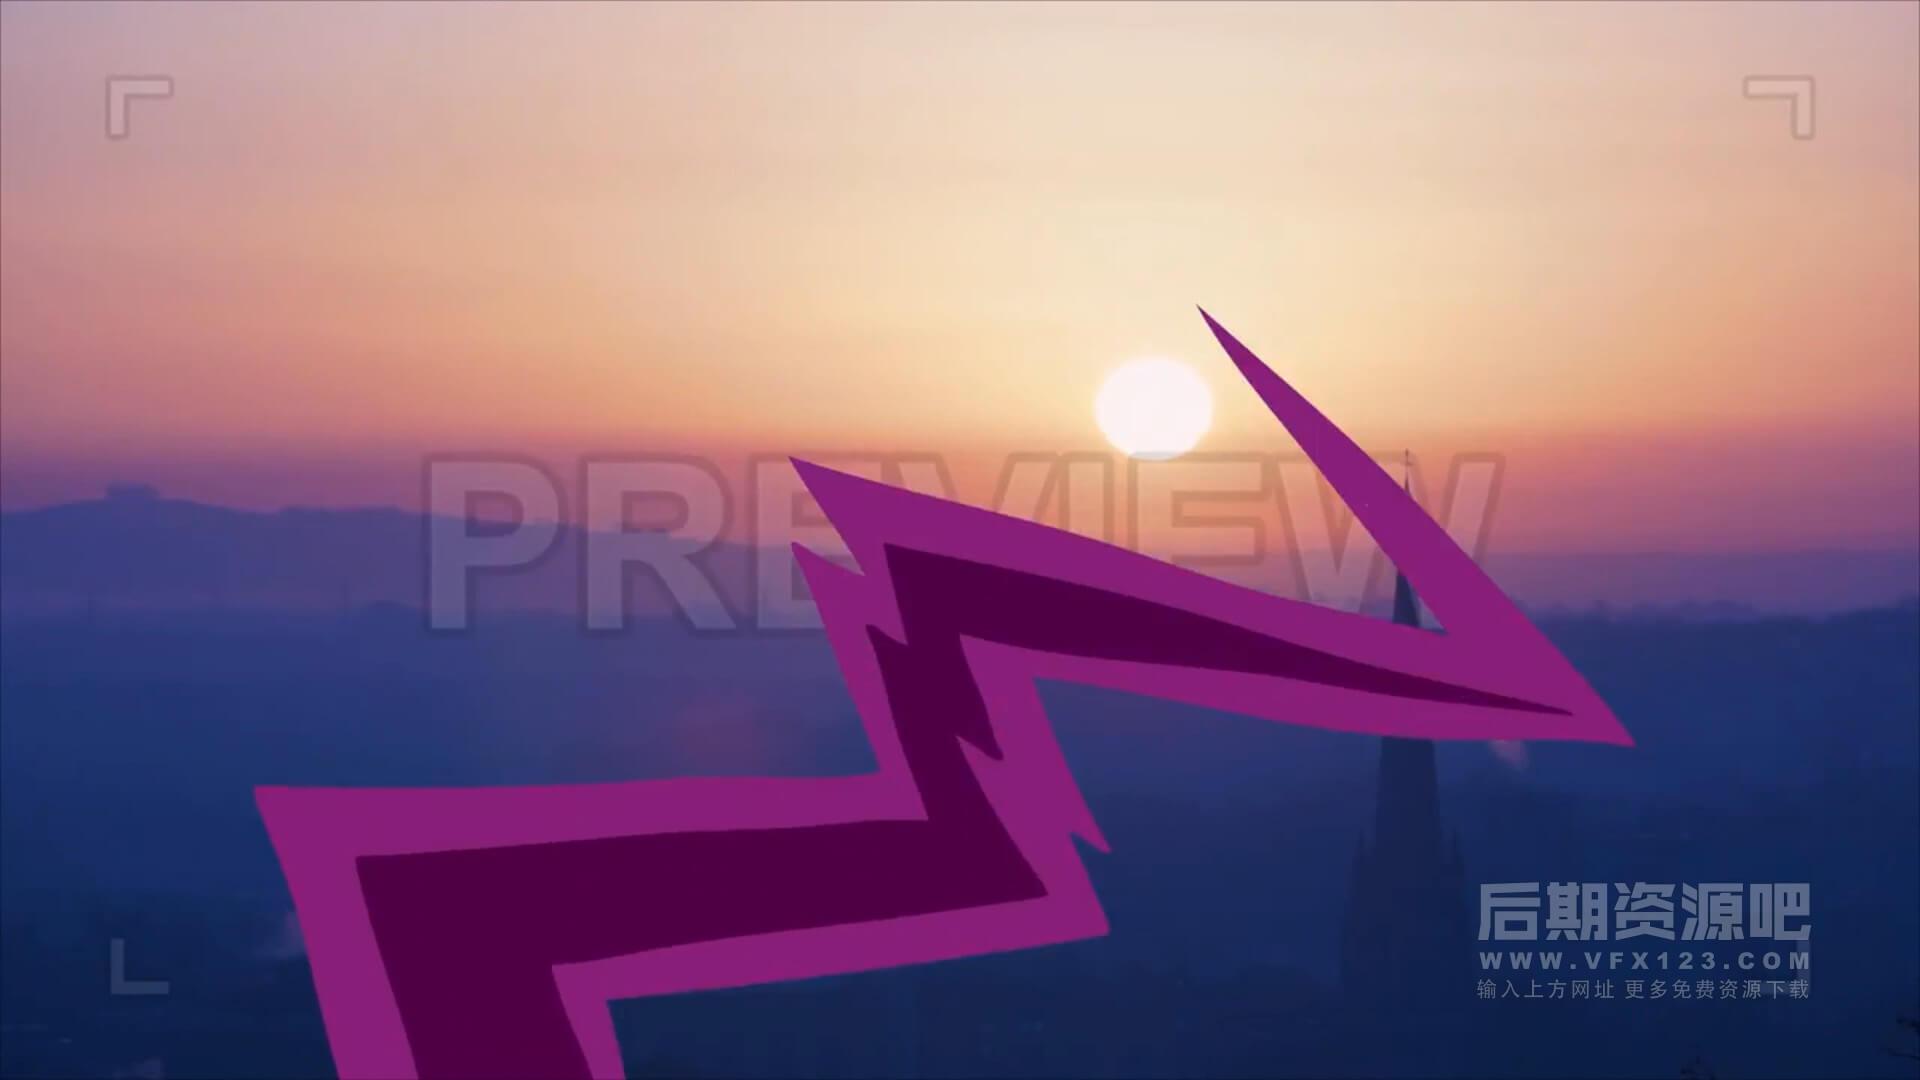 Fcpx转场插件 16组手绘卡通撕裂曲线闪电样式转场预设 Curves Transition